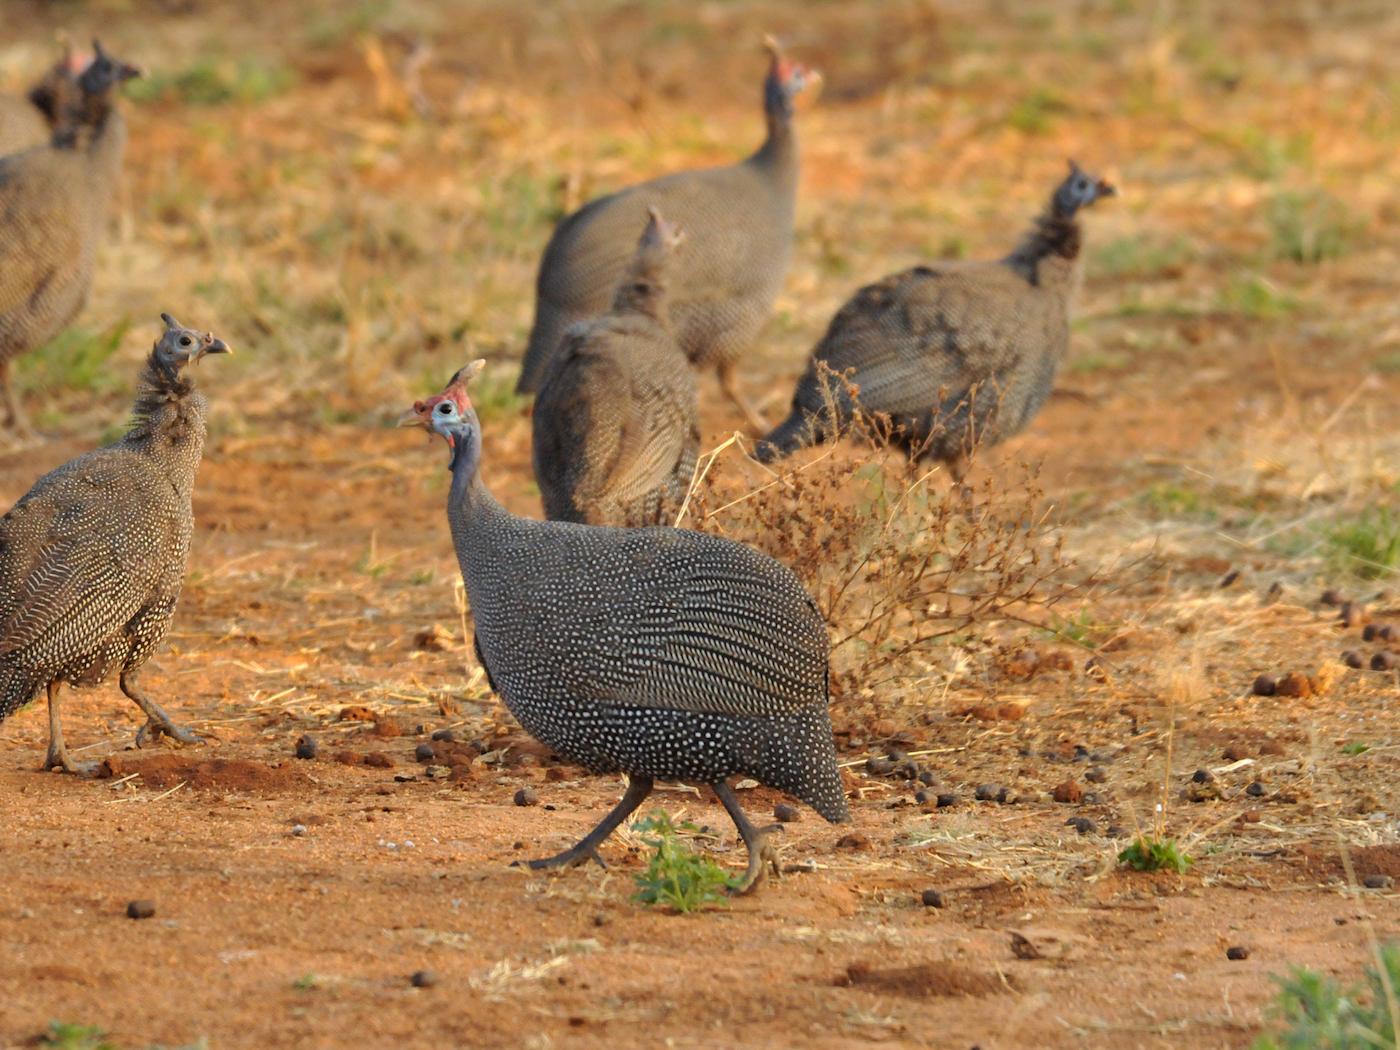 bird-hunting-africa-07